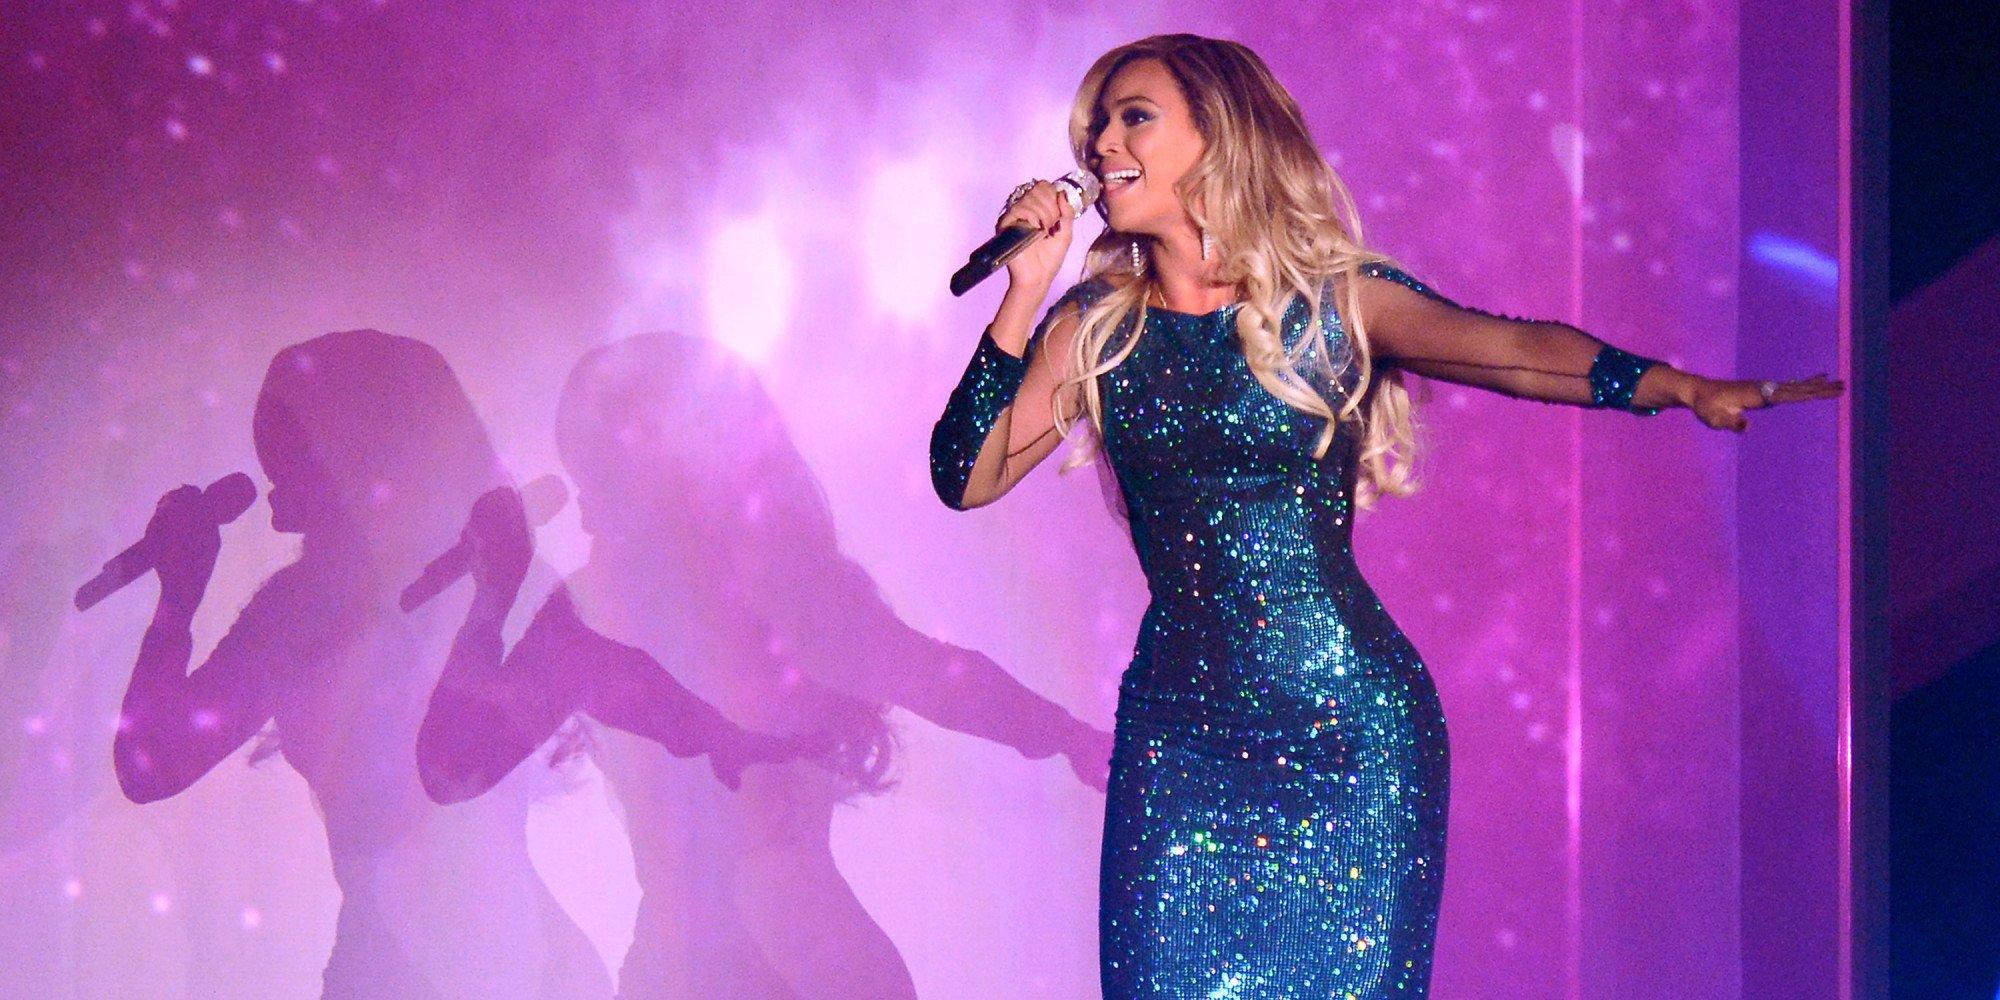 Why Wasn't Beyonce at Billboard Music Awards 2015?